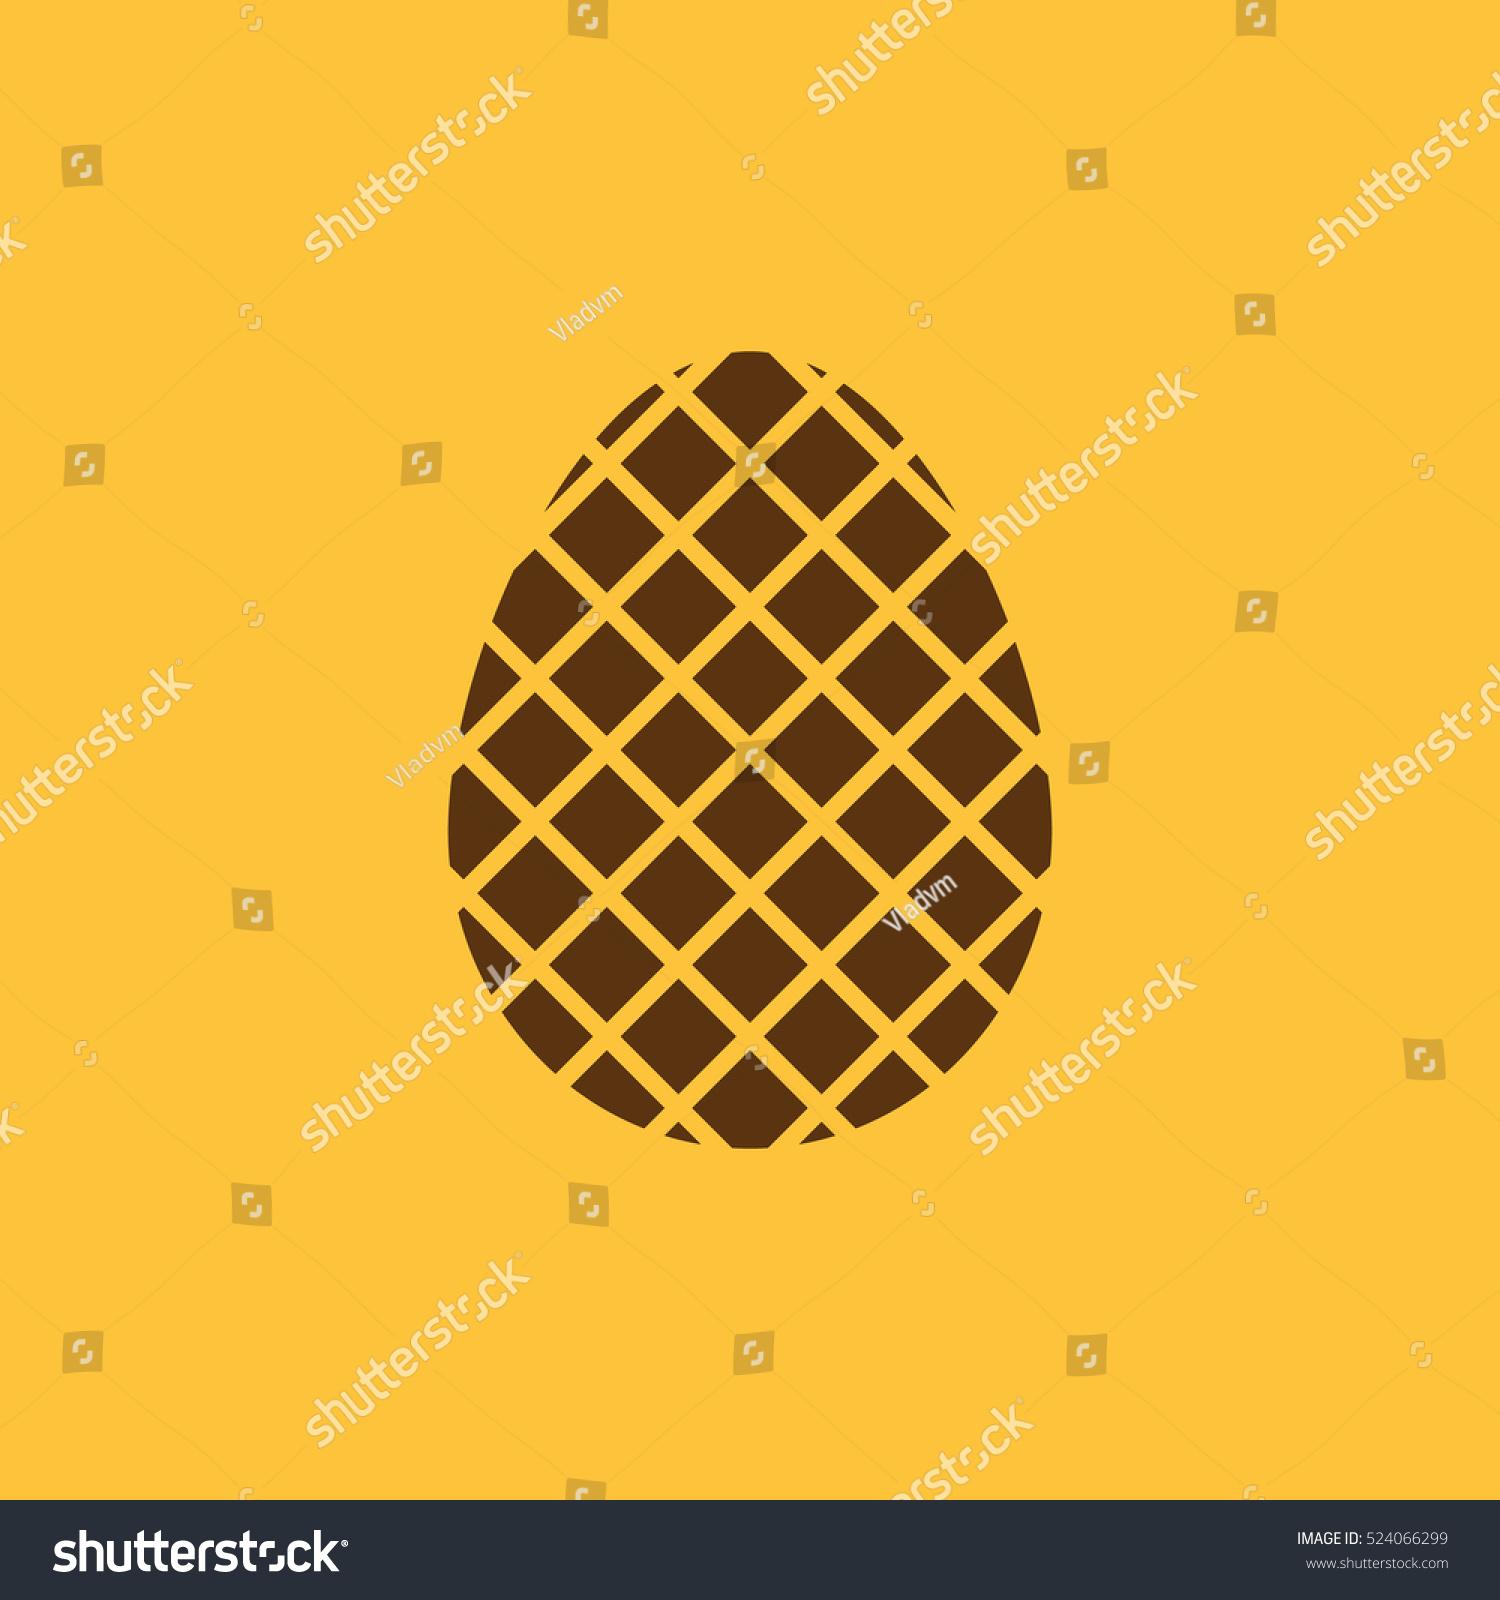 Egg icon easter egg symbol ui stock illustration 524066299 the egg icon easter egg symbol ui web logo sign buycottarizona